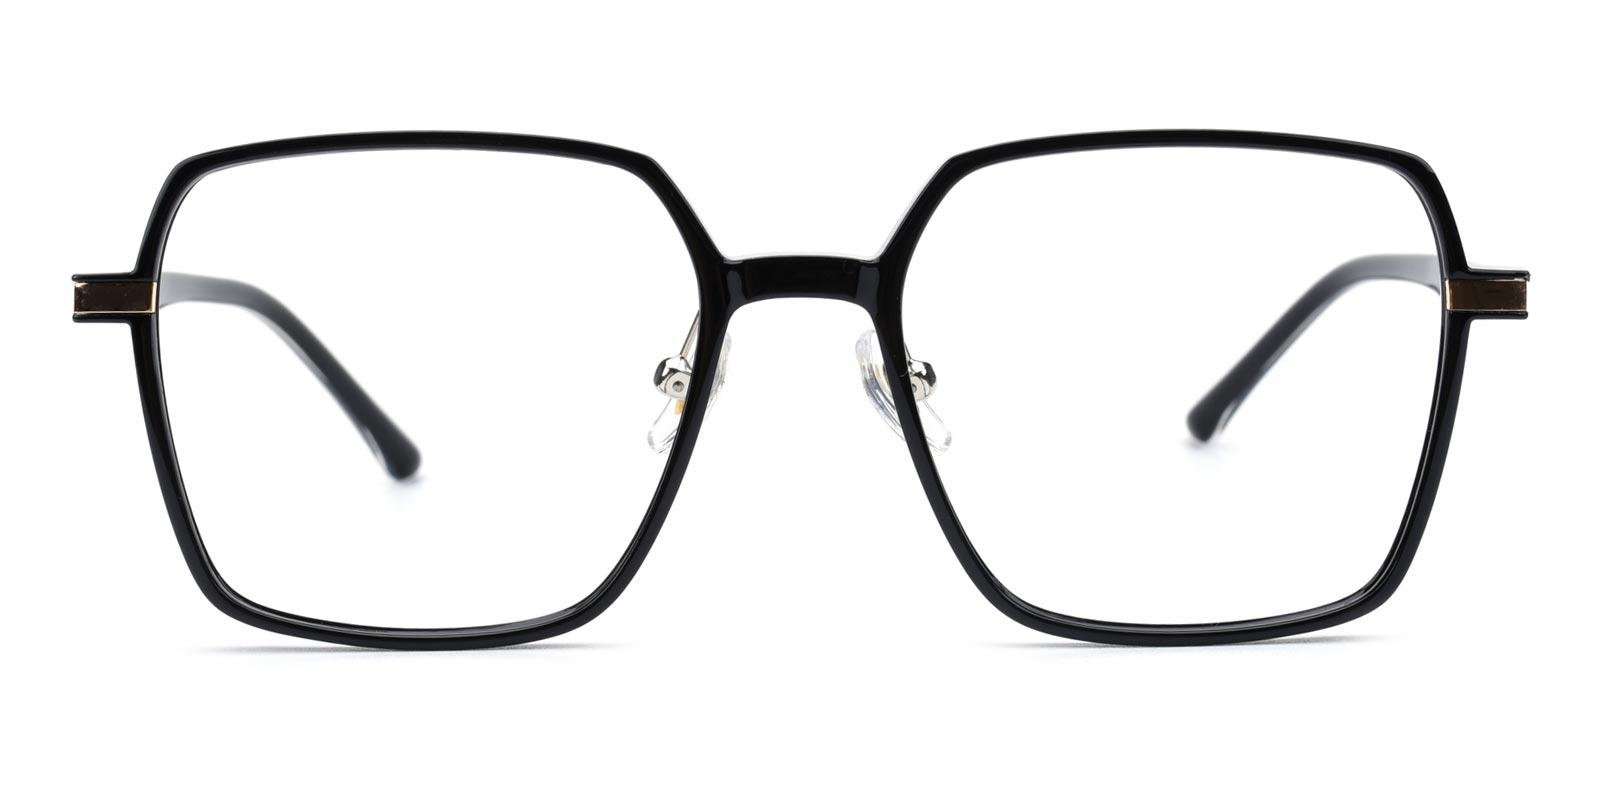 Decent-Black-Geometric-Acetate-Eyeglasses-additional2